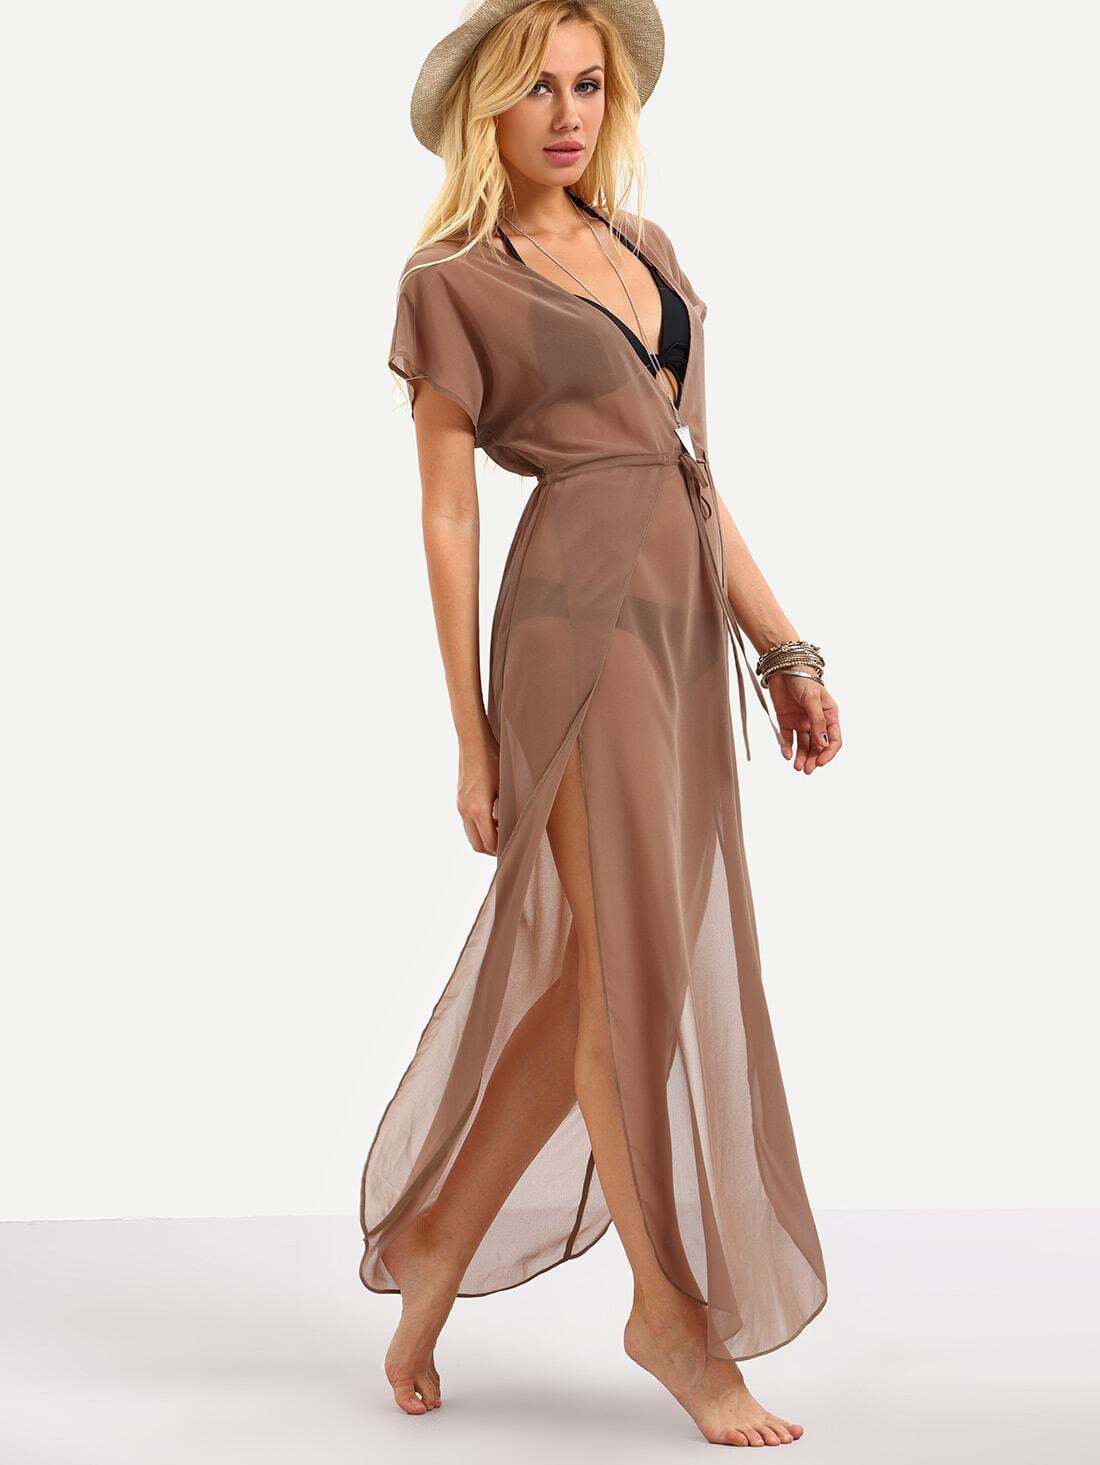 Фото #1: Plunging V-Neckline Drawstring Waist Split Dress